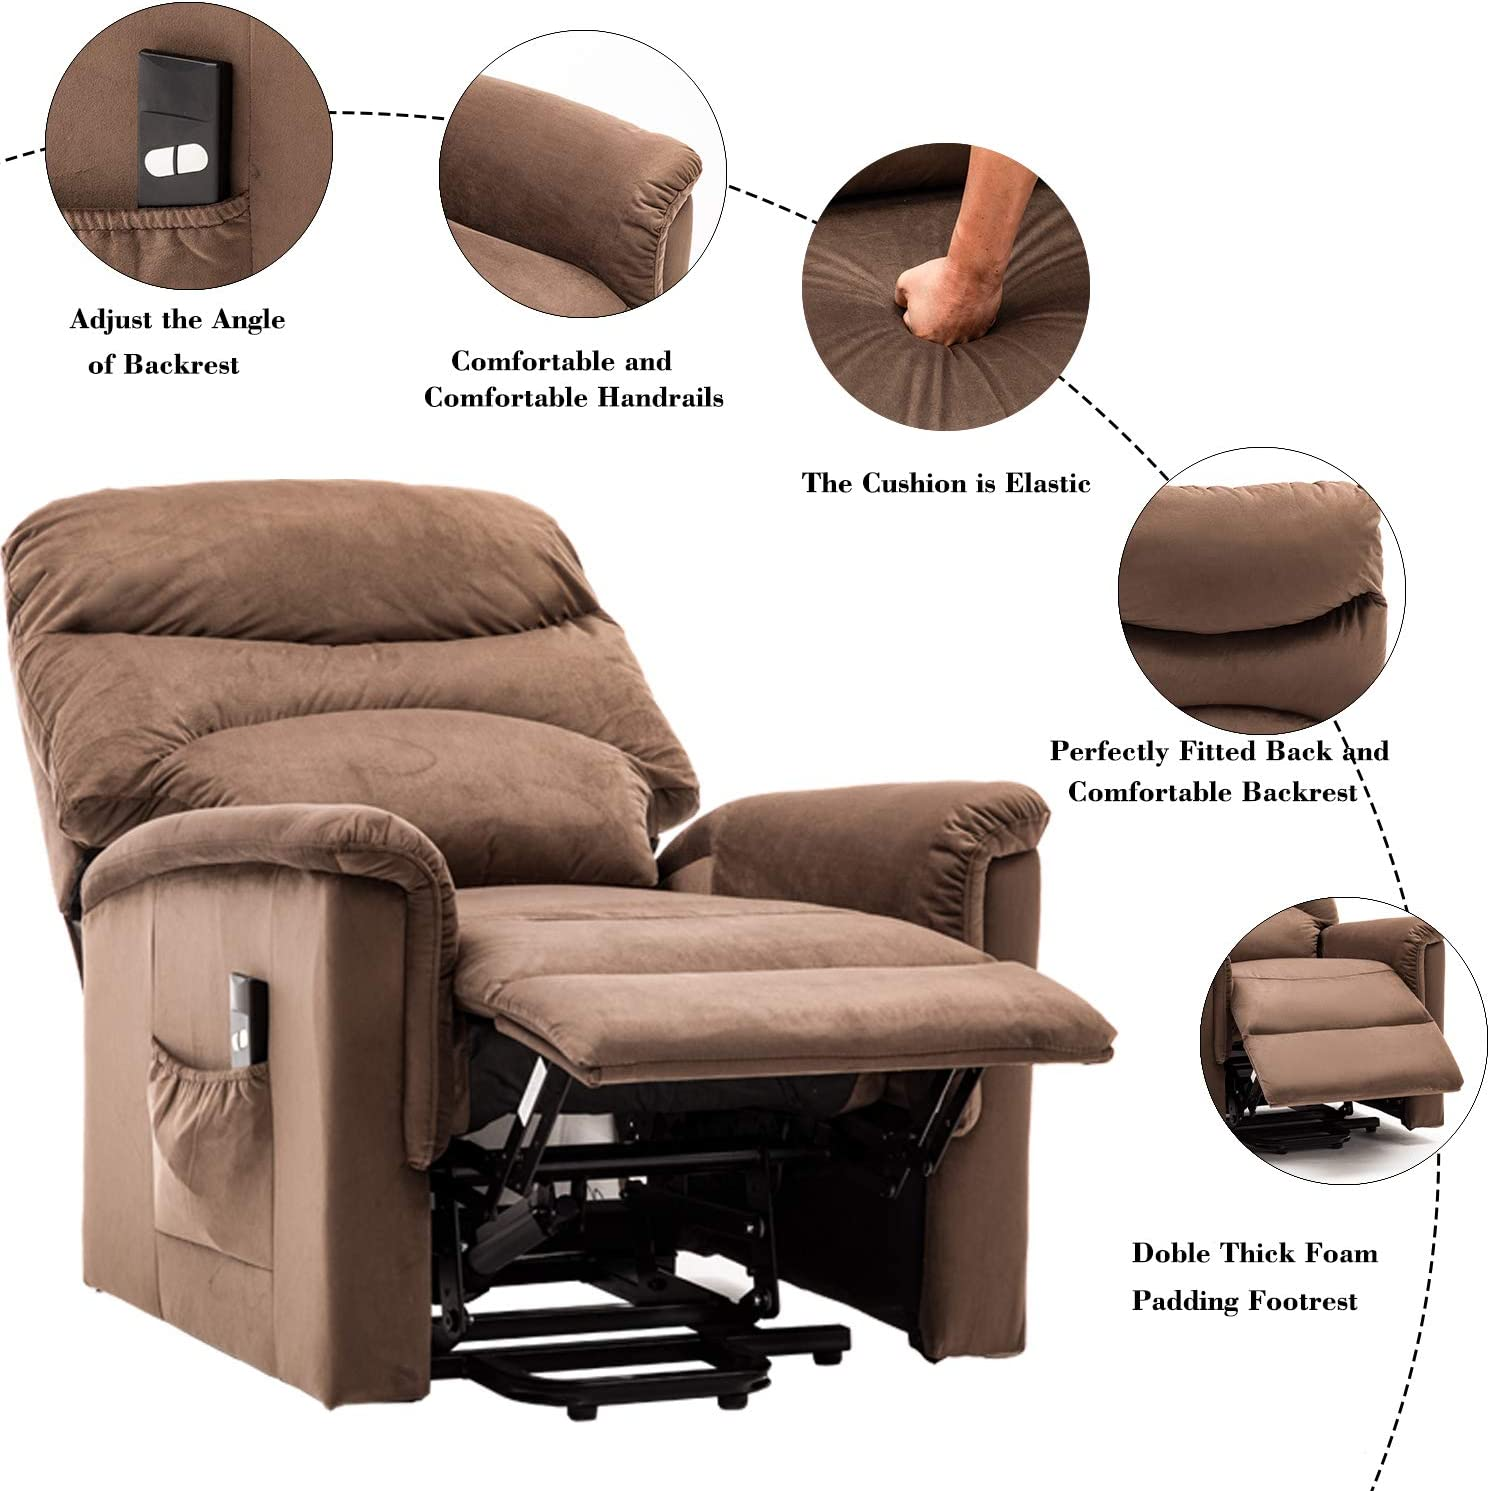 Bonzy Home Futon Sofa Bed Sofa CBonzy Home Futon Sofa Bed Brown PU Leather Futon Couch